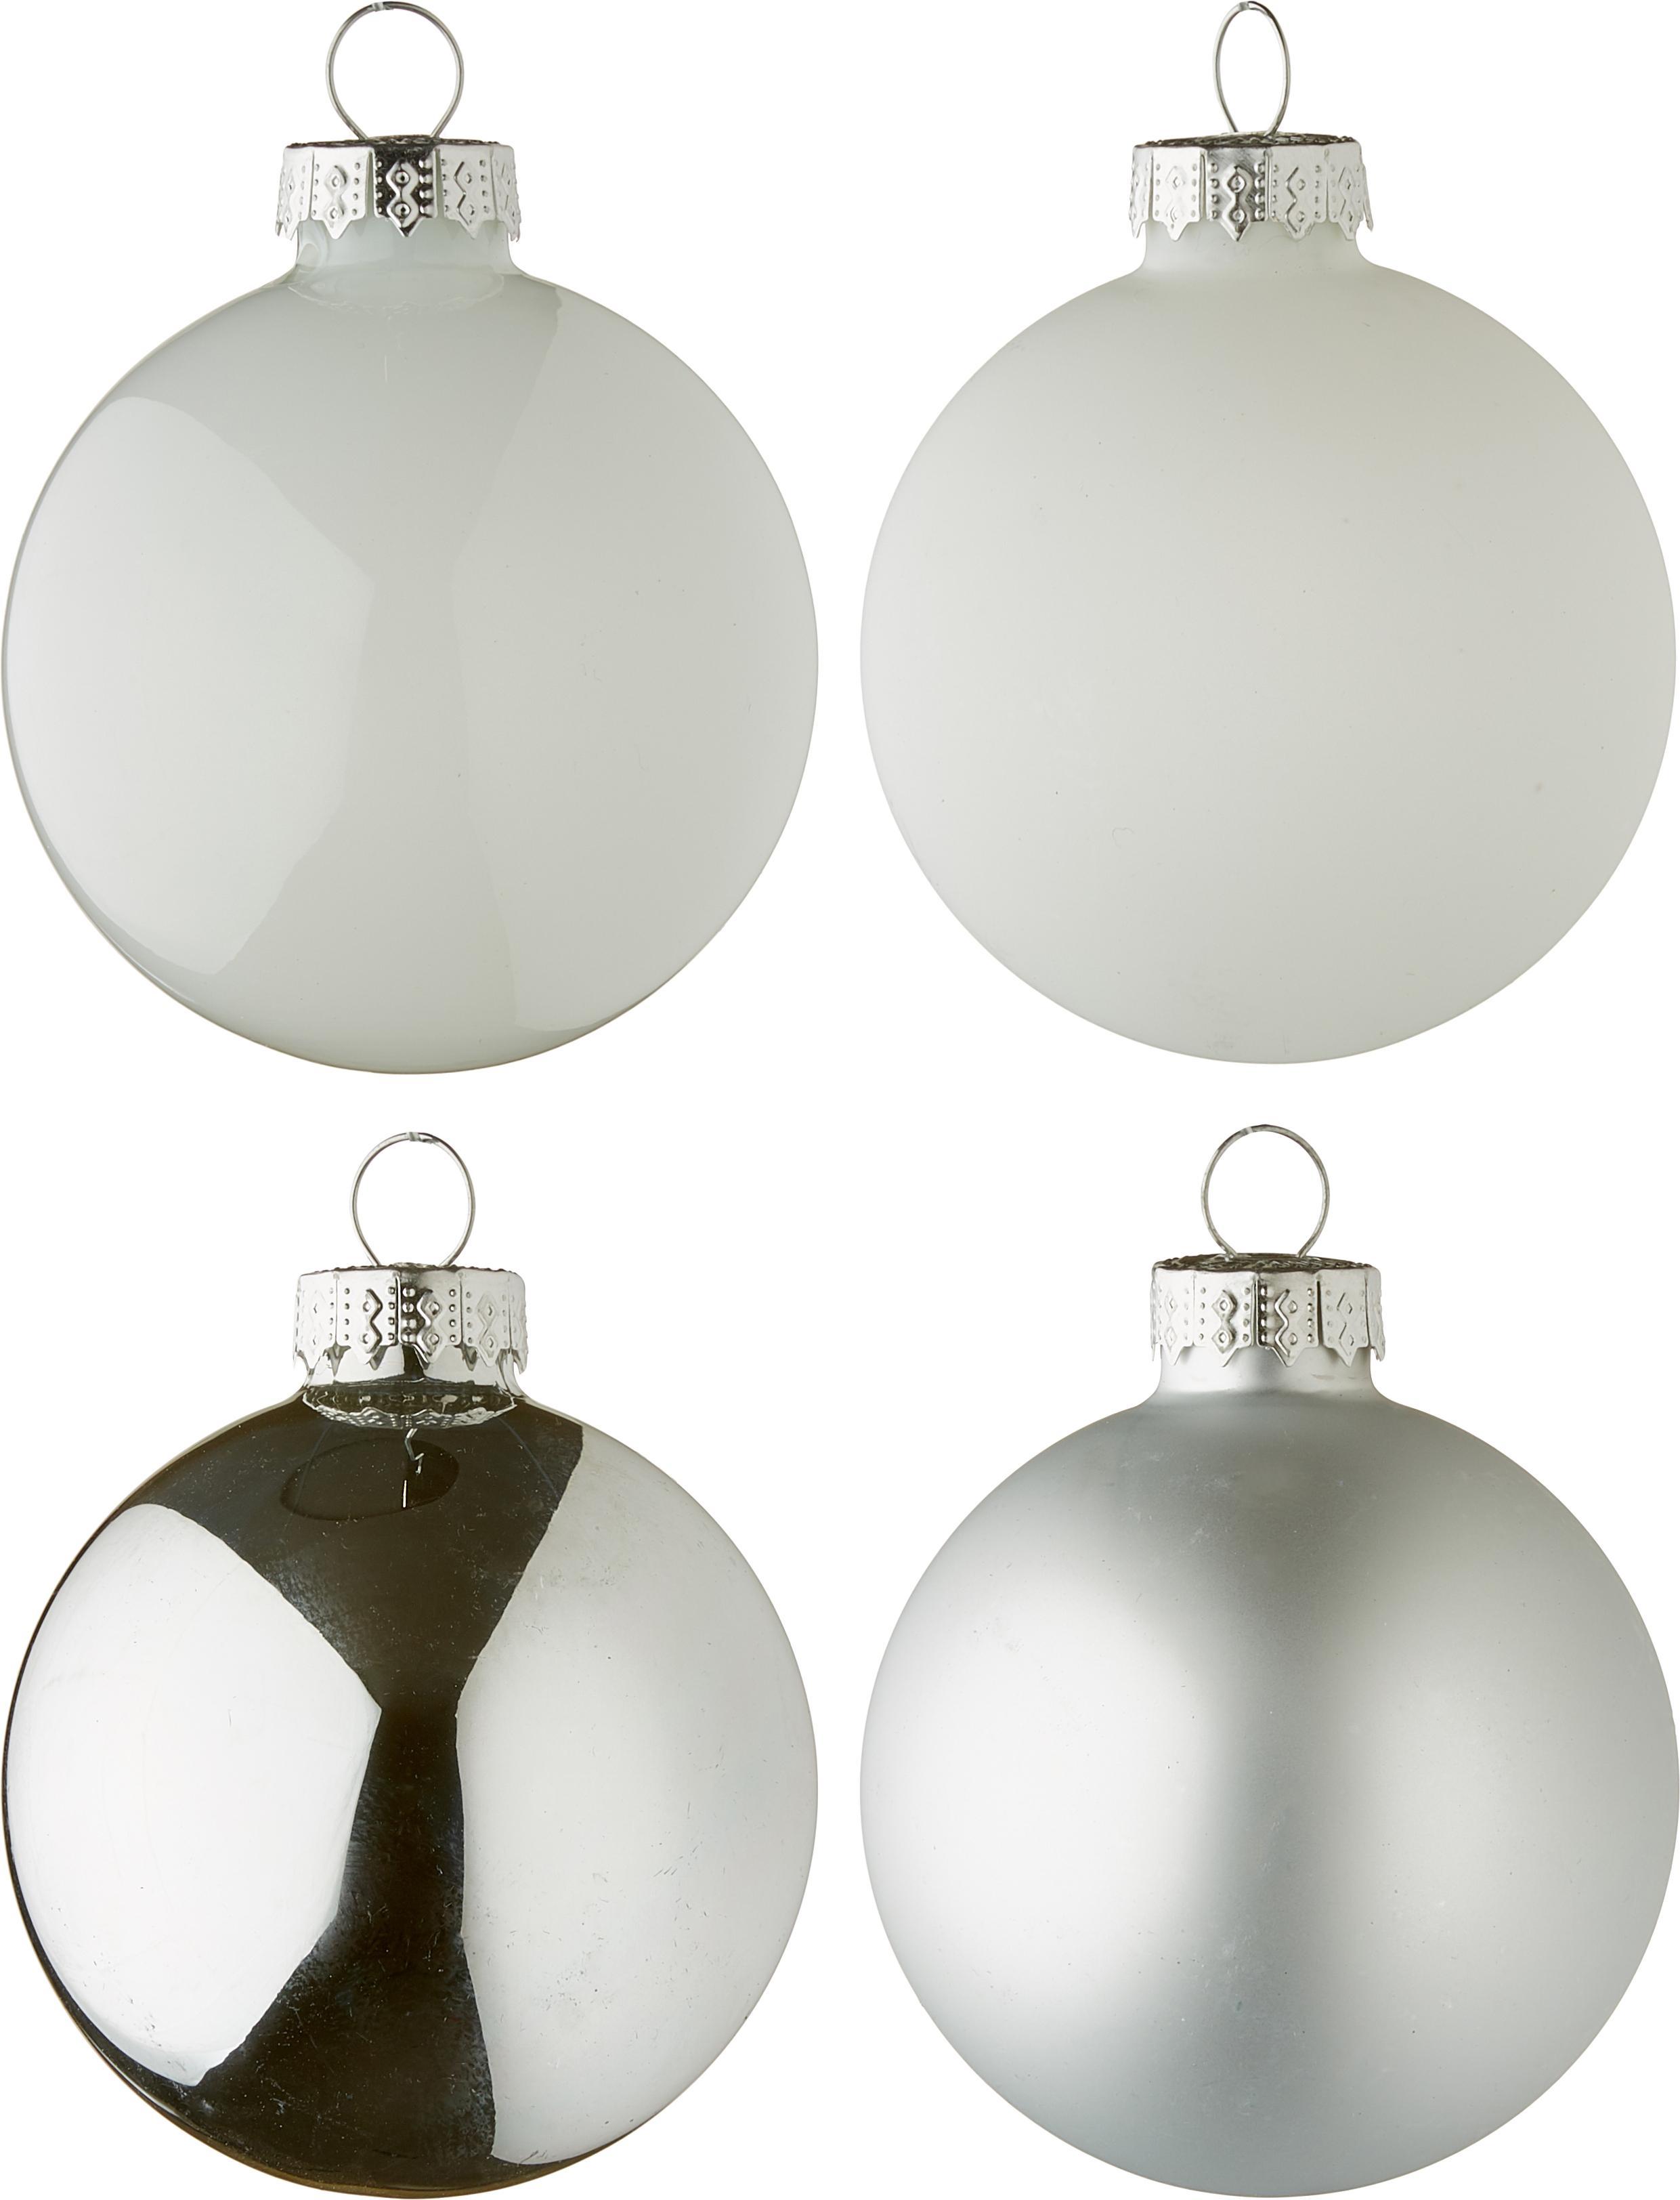 Set 24 palline di Natale Lorene, Argento, bianco, opaco e lucido, Ø 6 cm